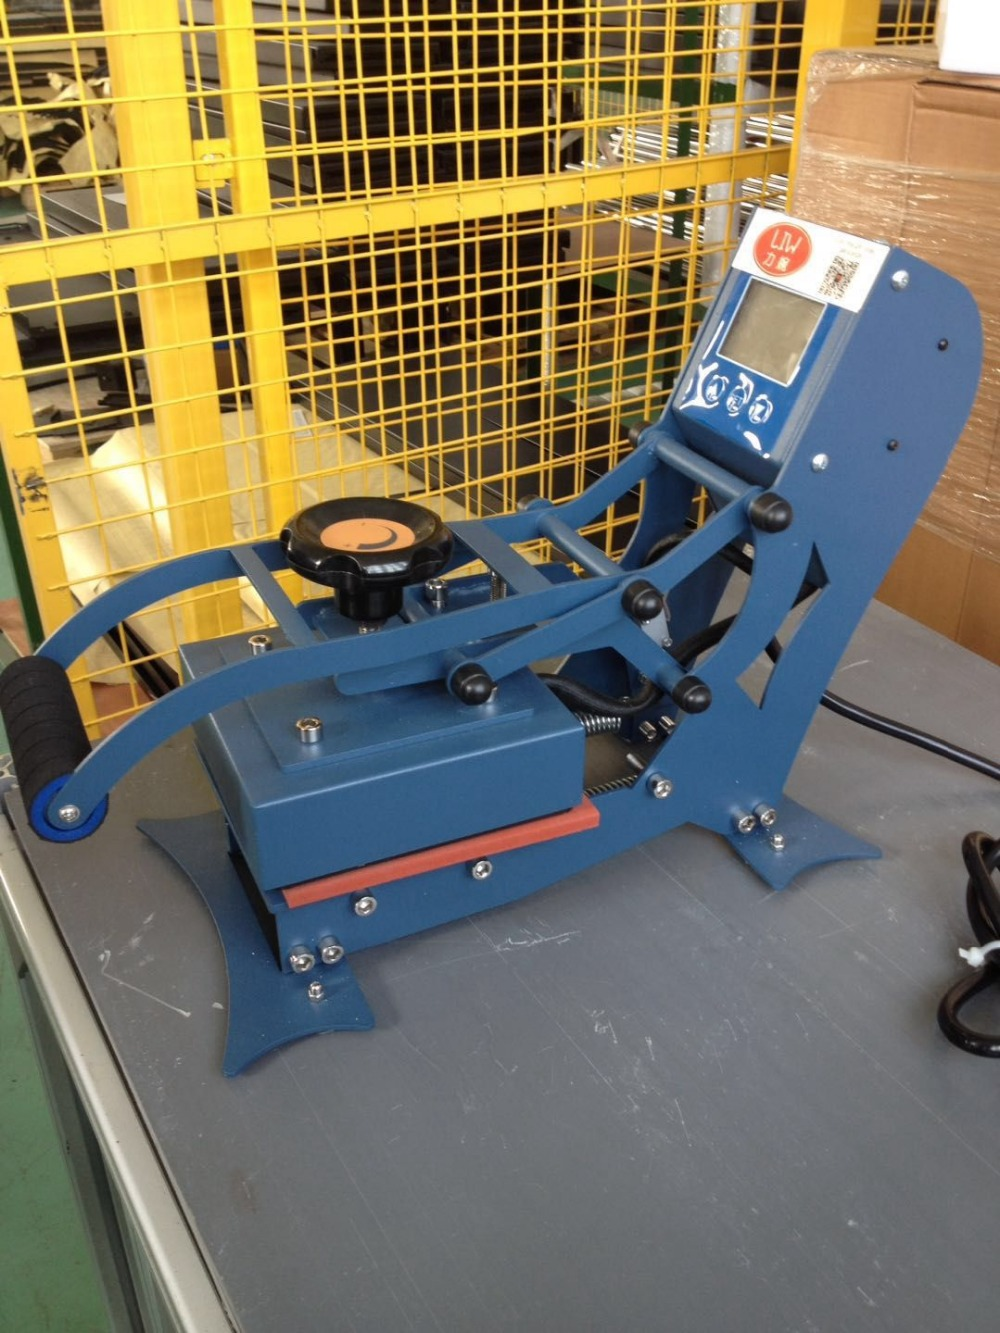 DIY Digital Pen Press Machine Pen Heat Transfer Printing machines at once Printer Machine 110V/220V 1pc